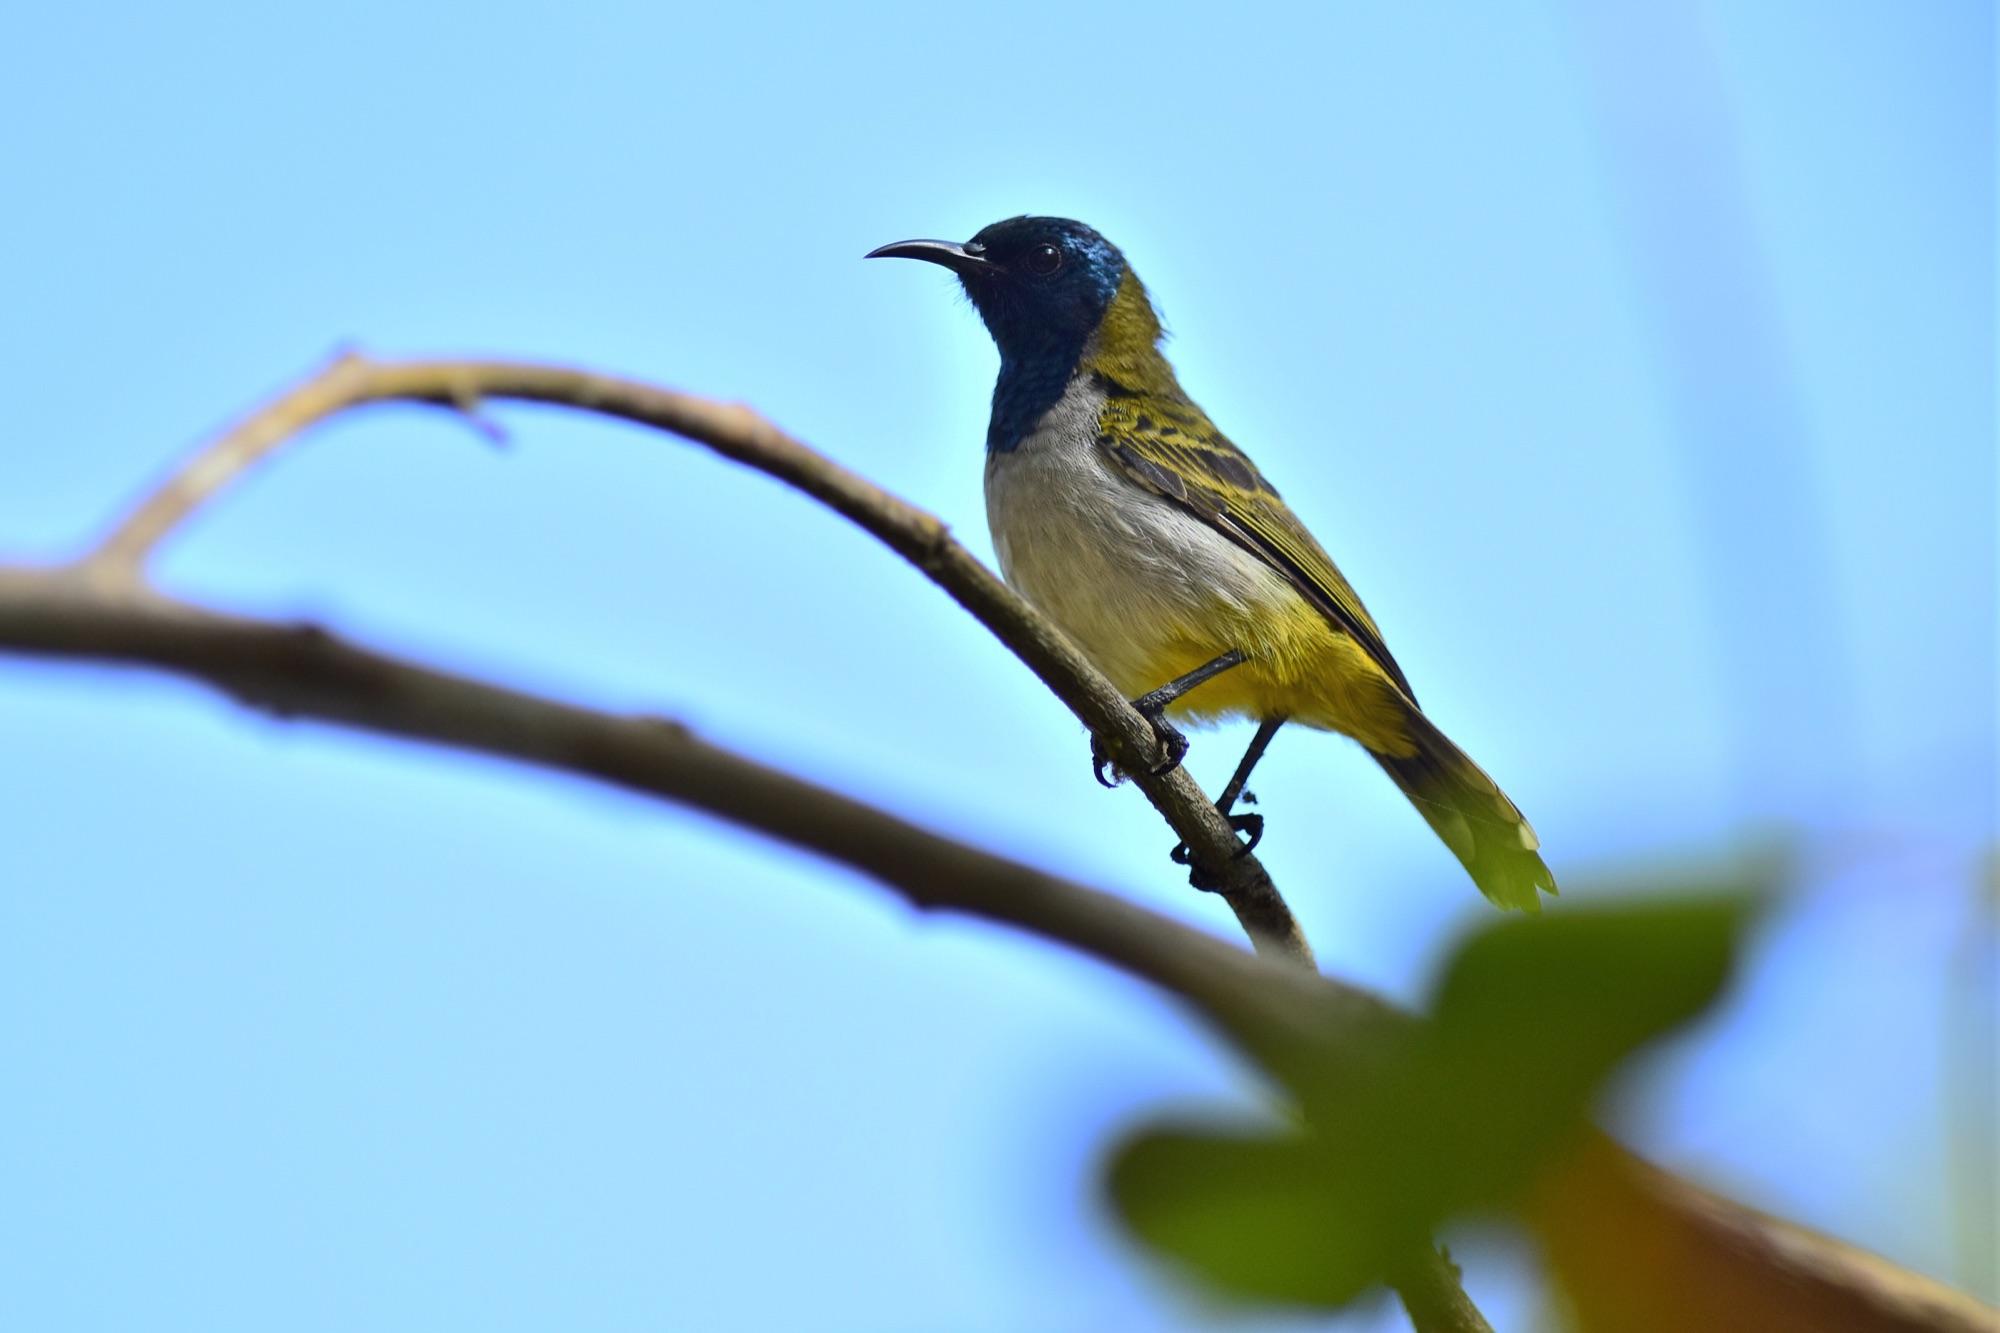 Reichenow's Sunbird, Ghana by Nick Bray